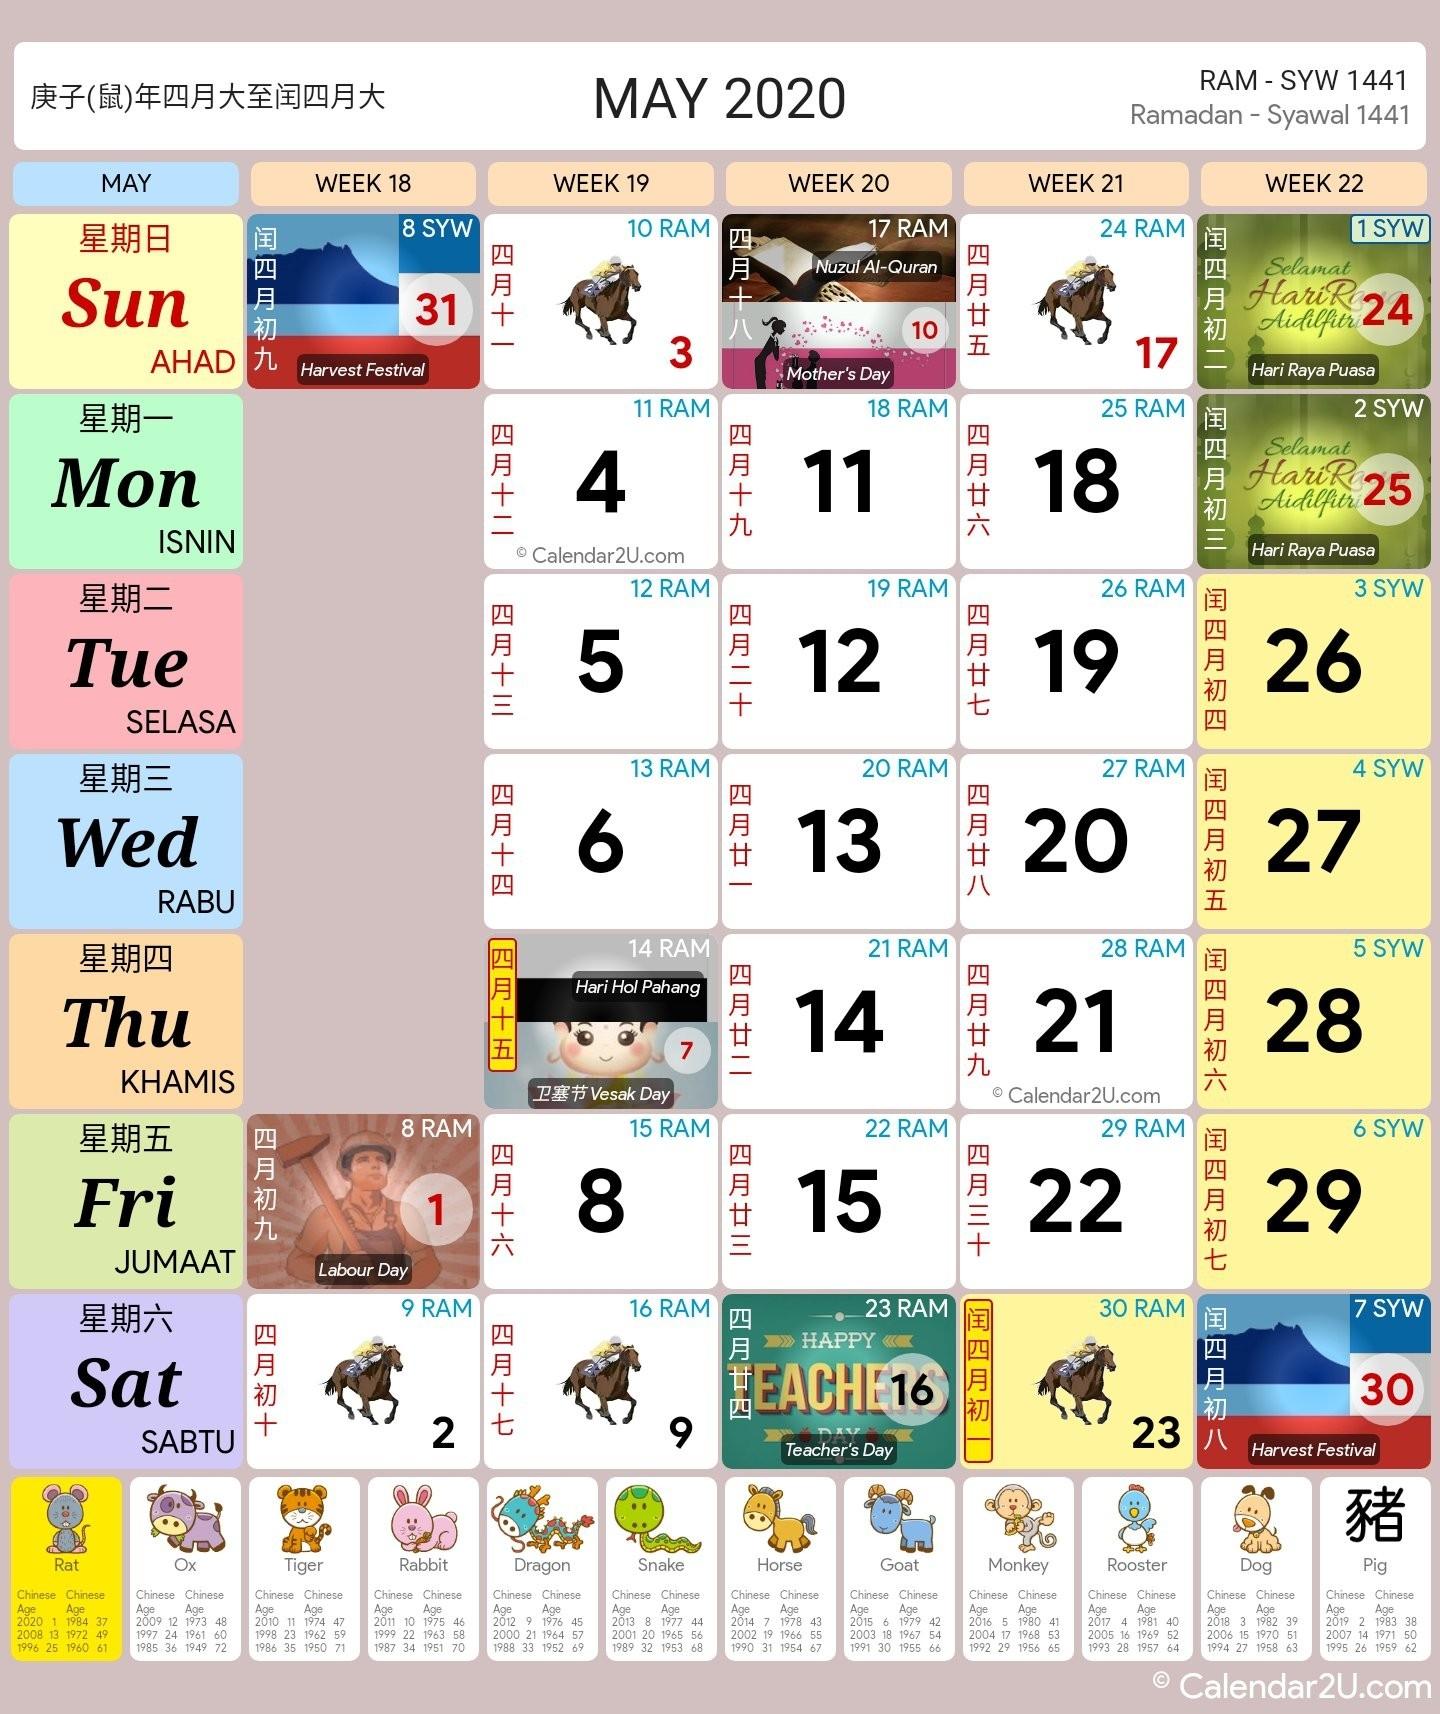 Malaysia Calendar Year 2020 (School Holiday) - Malaysia Calendar-Malaysia School Holidays 2020